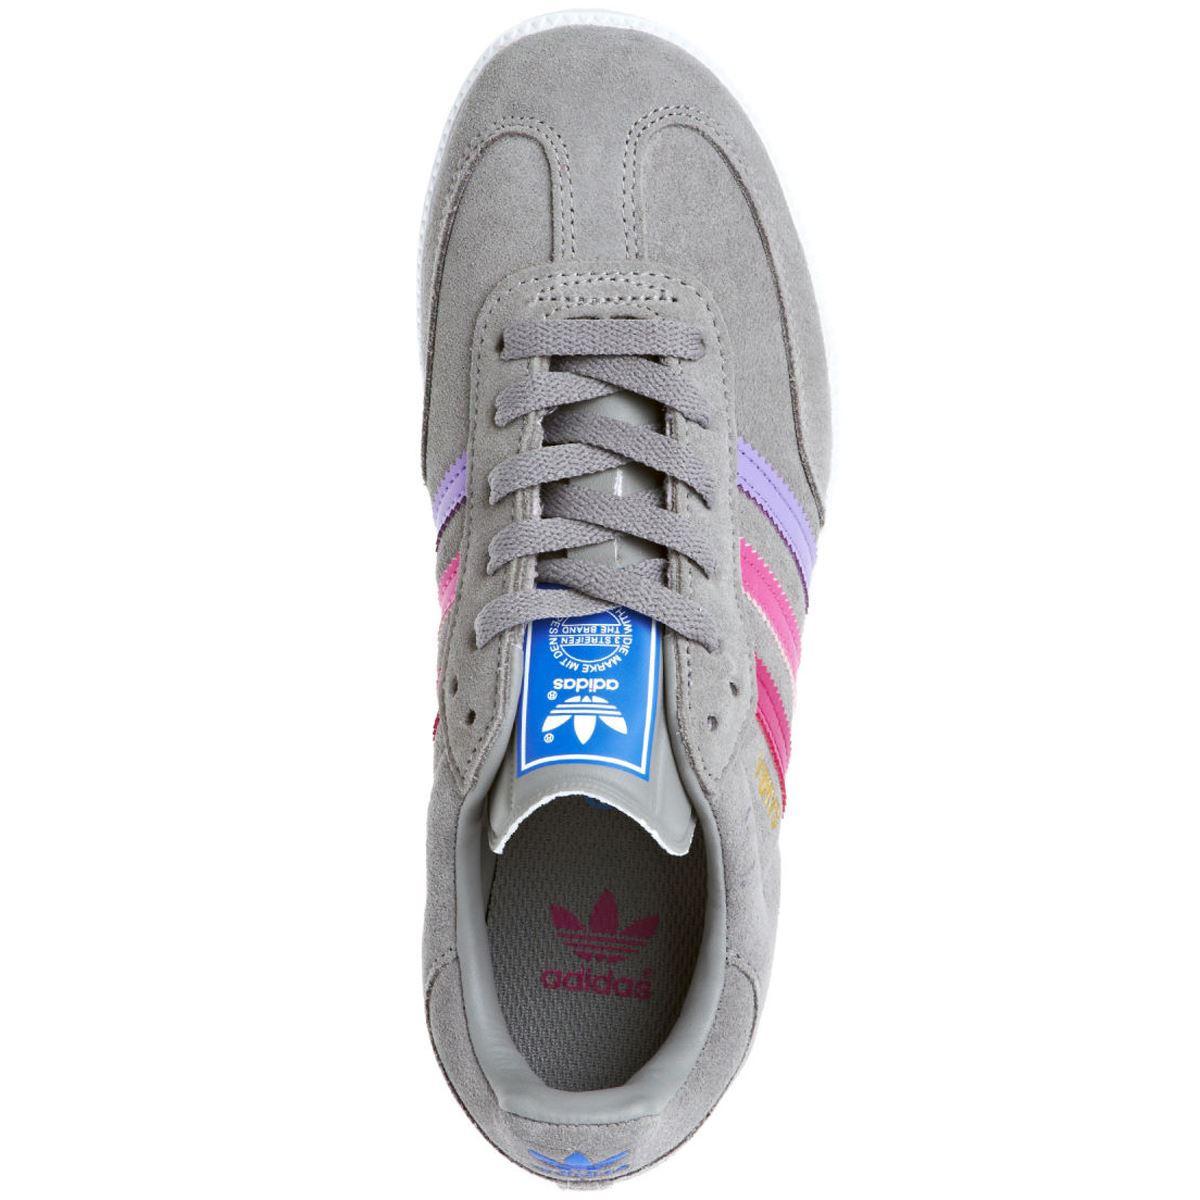 Adidas originals samba sneaker bambino pelle vintage for Adidas che cambiano colore